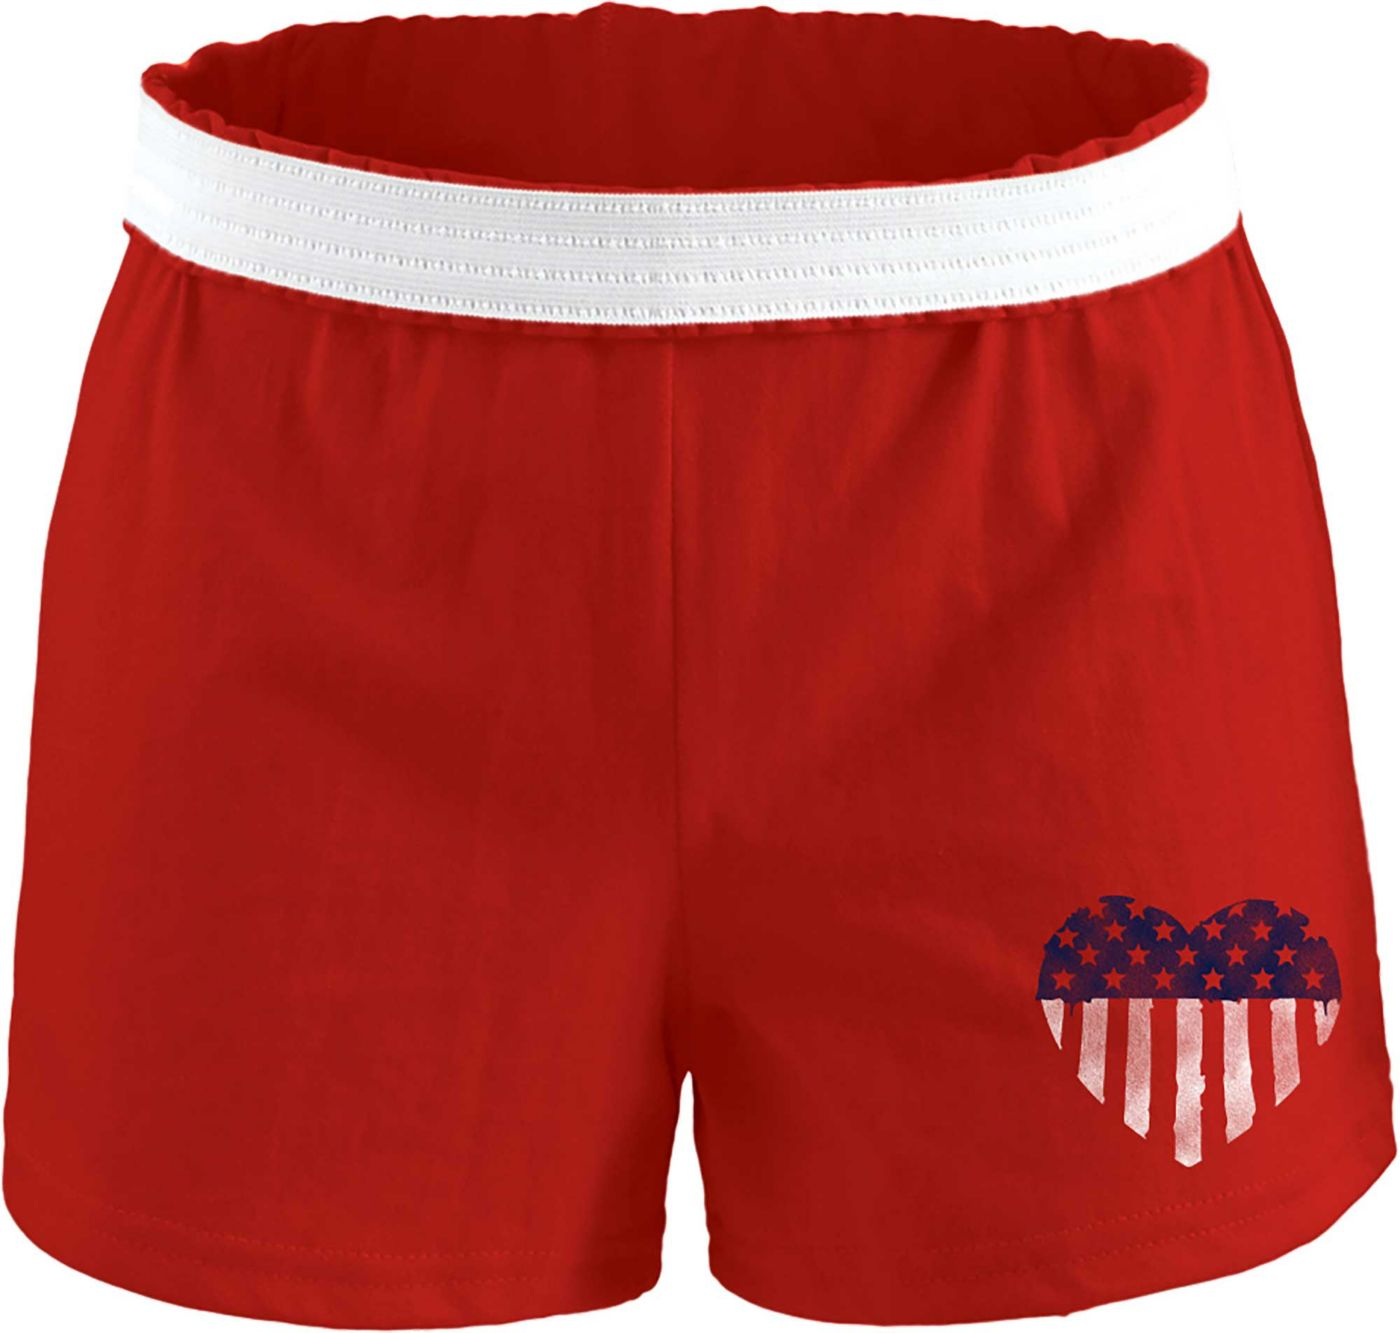 Soffe Juniors' Memorial Day Cheer Shorts